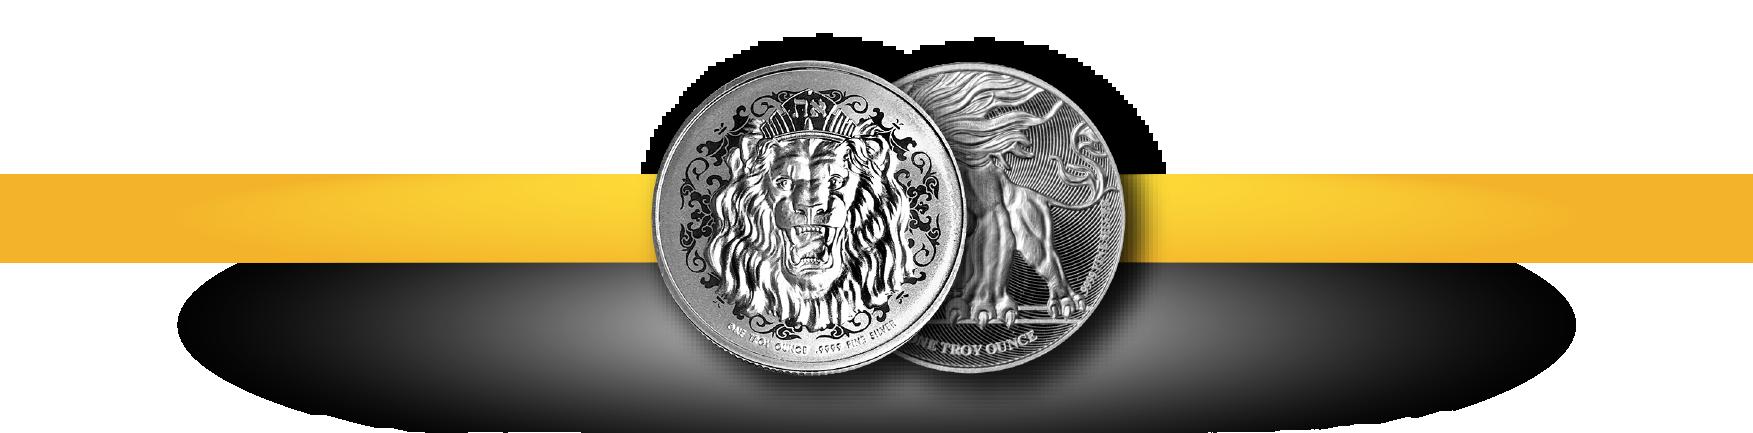 roaring lion coins bottom